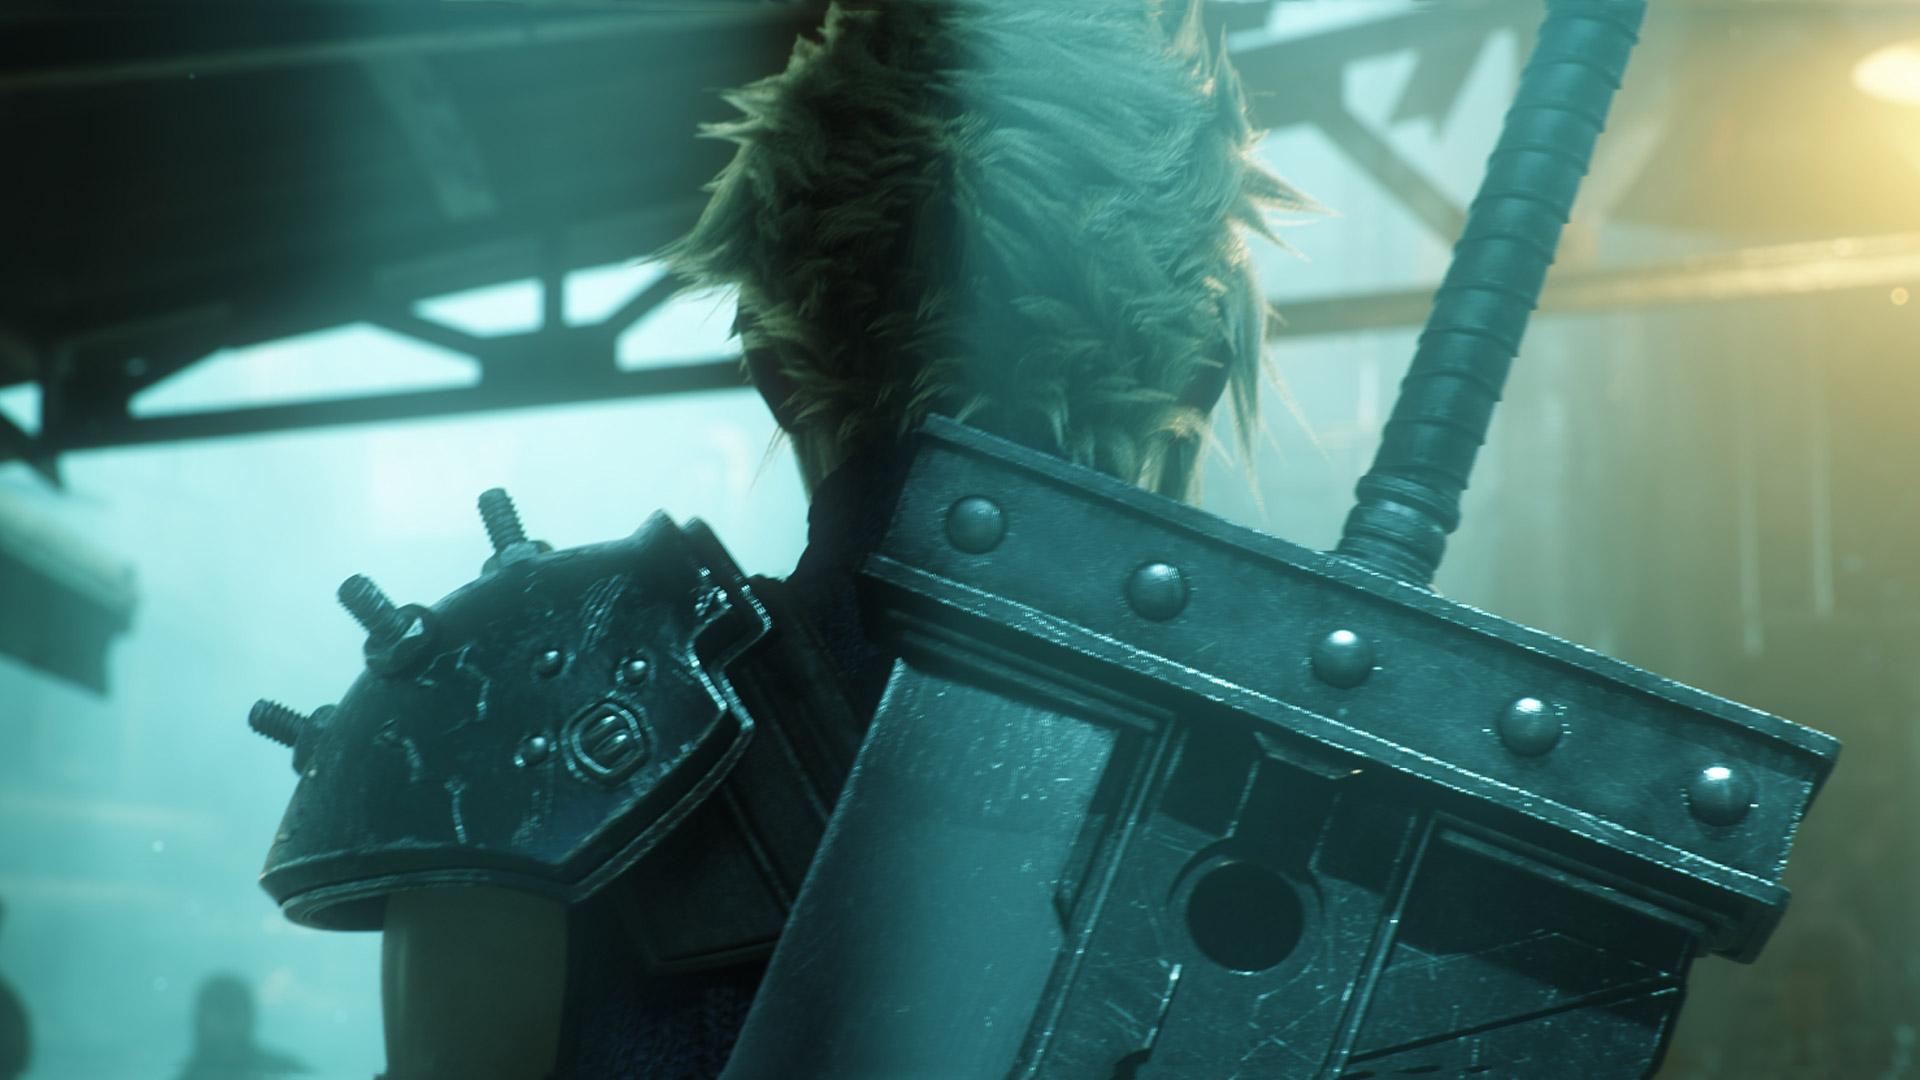 Download Final Fantasy 7 Remake Wallpaper Hd Hd Backgrounds Download Itl Cat